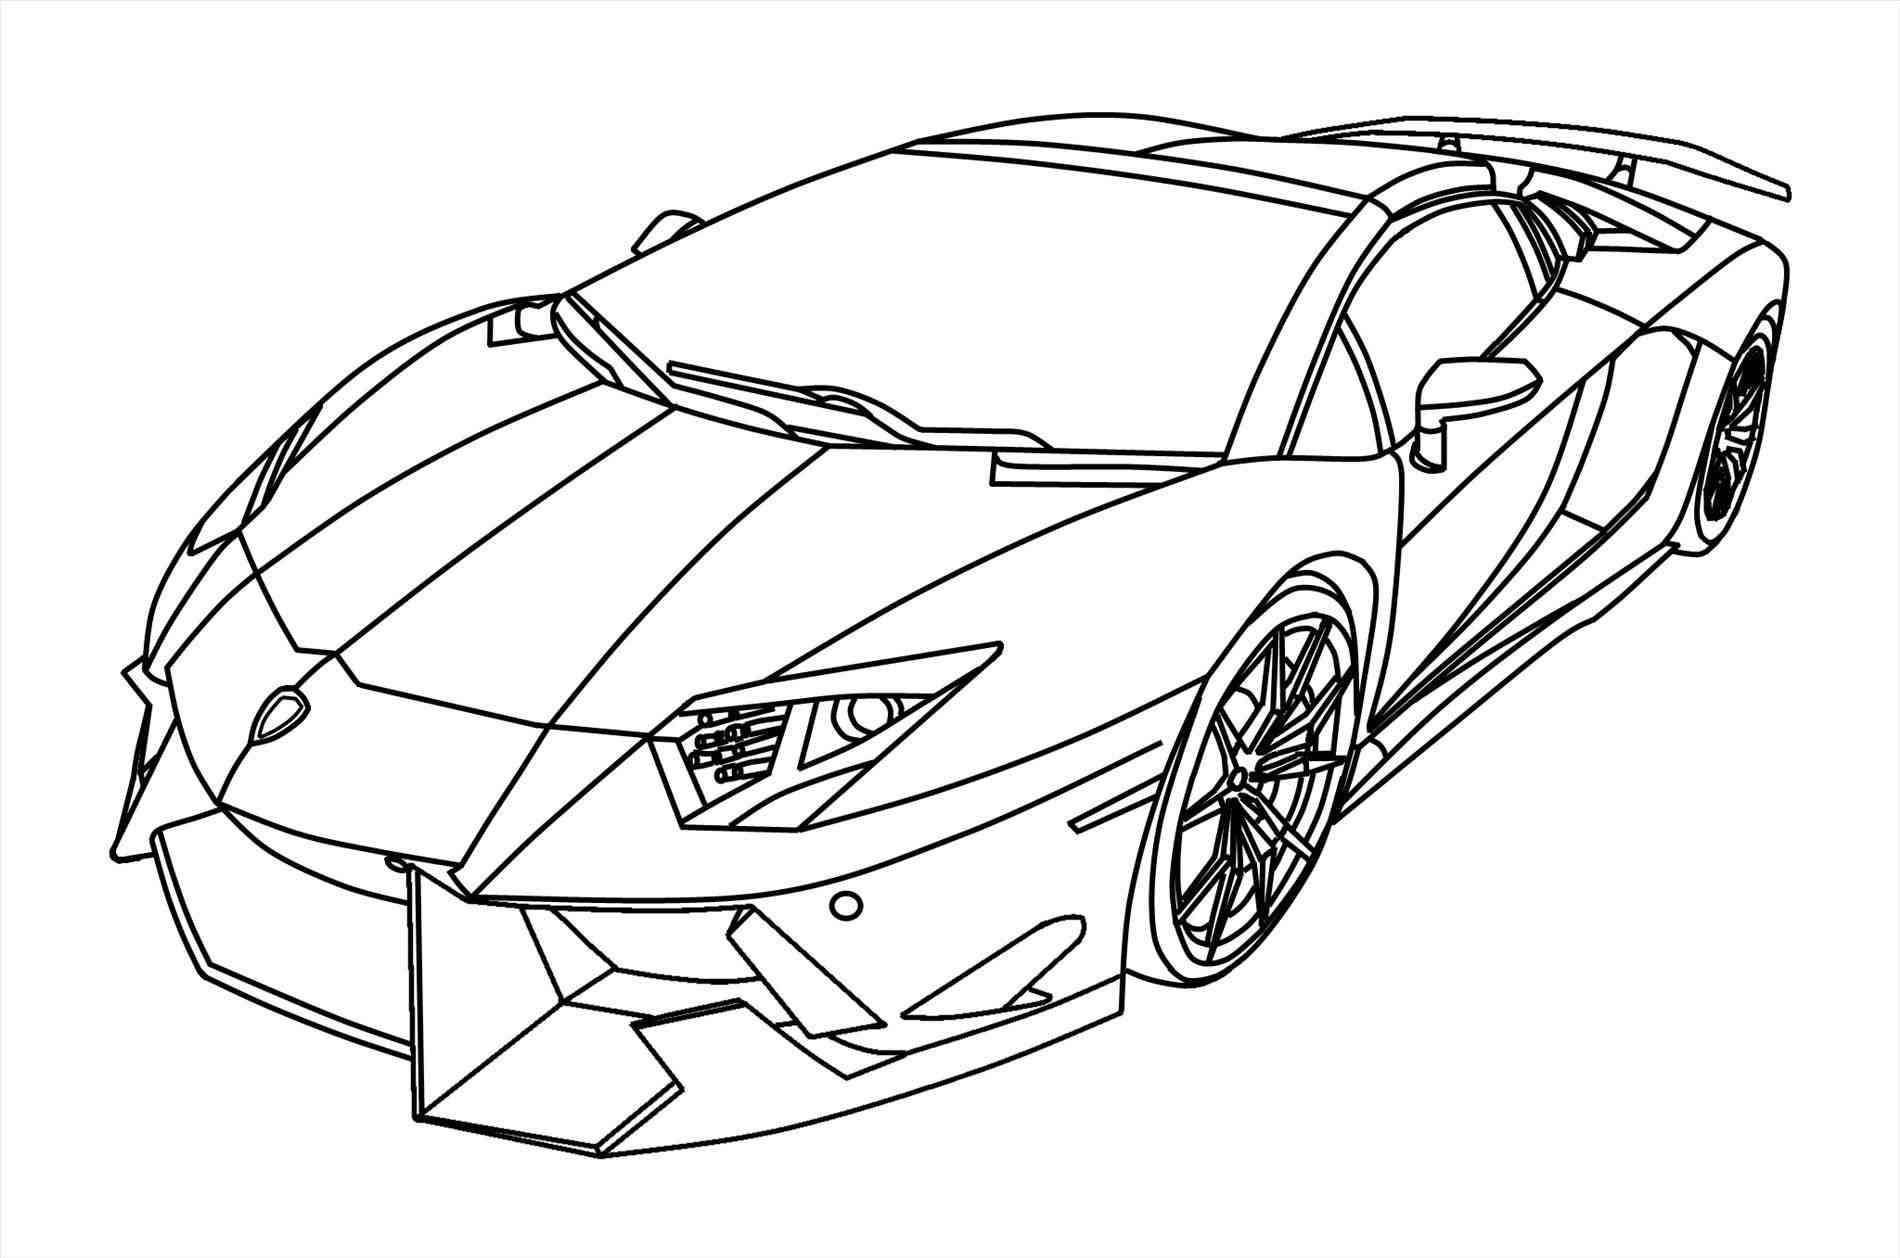 1900x1258 Lamborghini Aventador Drawing Outline Hd Wallpaper Cars